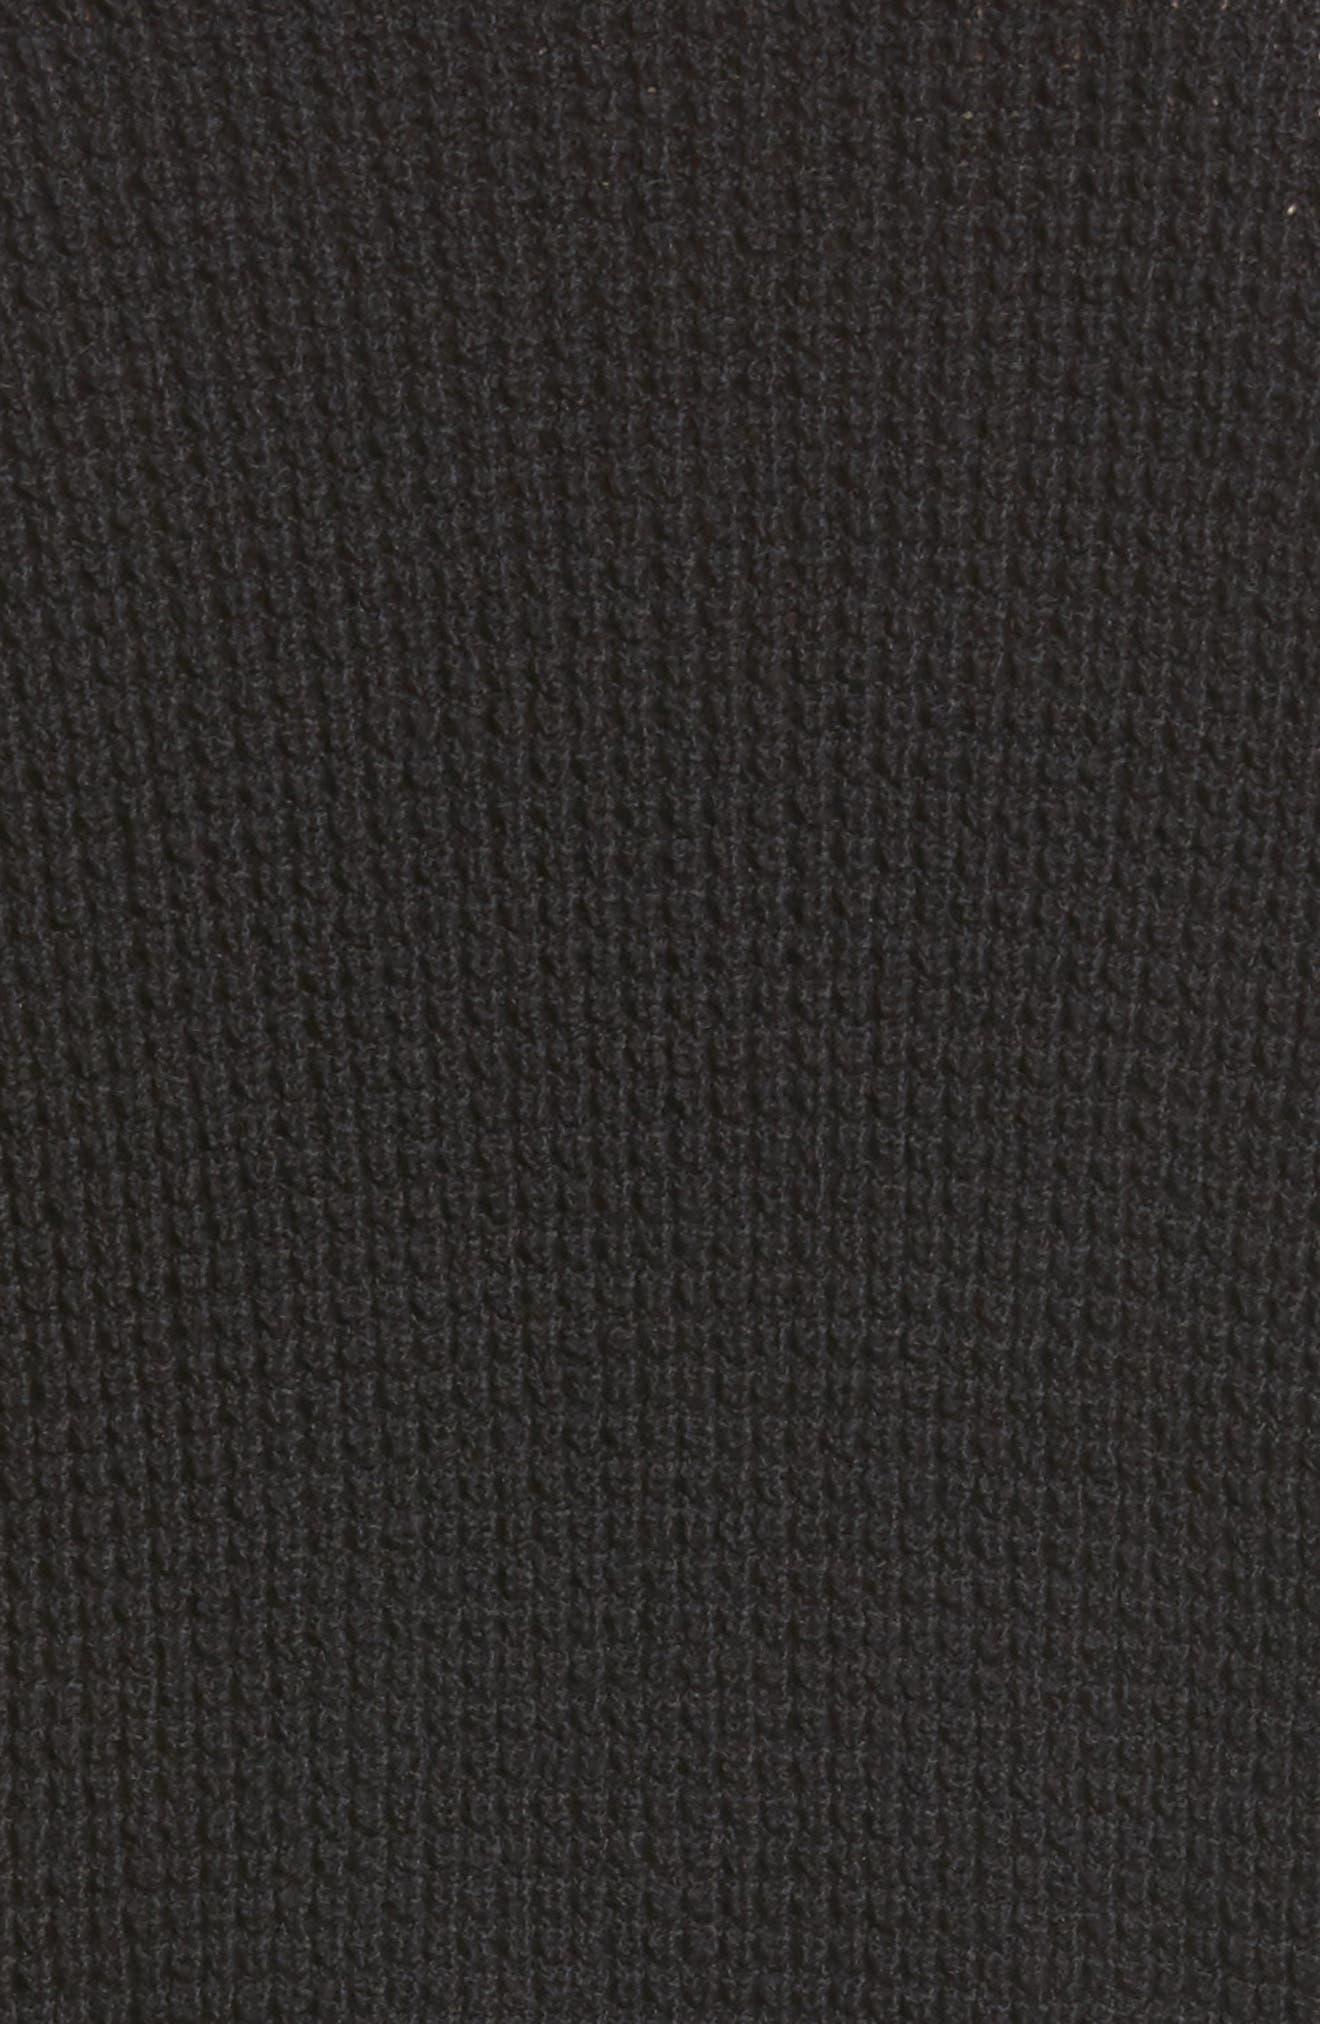 Stephanie Surplice Sweater,                             Alternate thumbnail 5, color,                             001